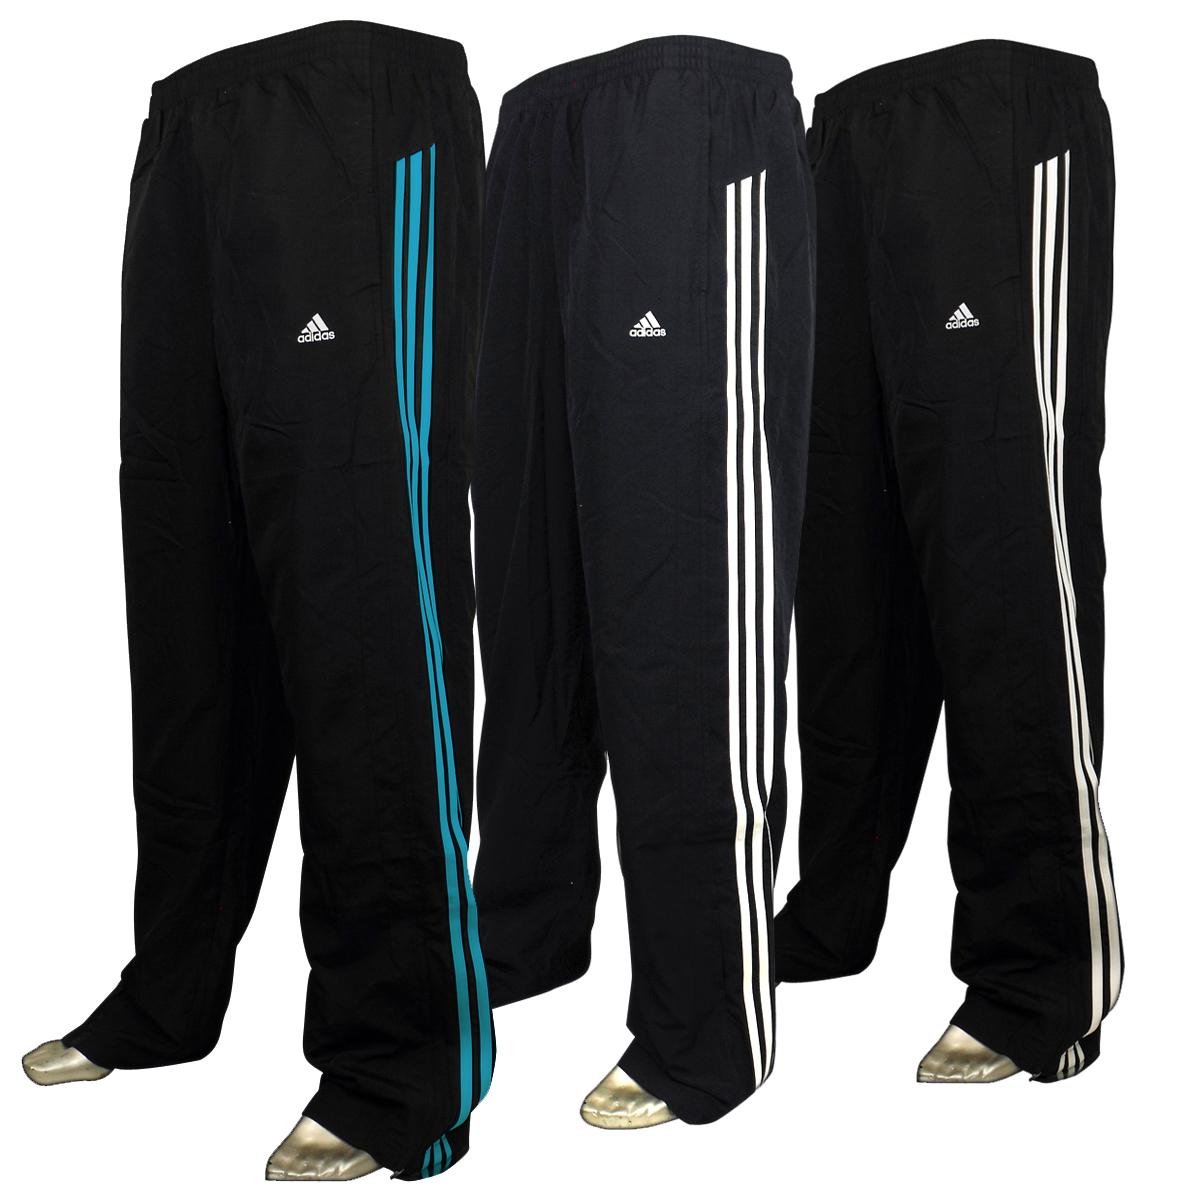 Mens Adidas Tracksuit Bottoms Size 2xl Men's Clothing